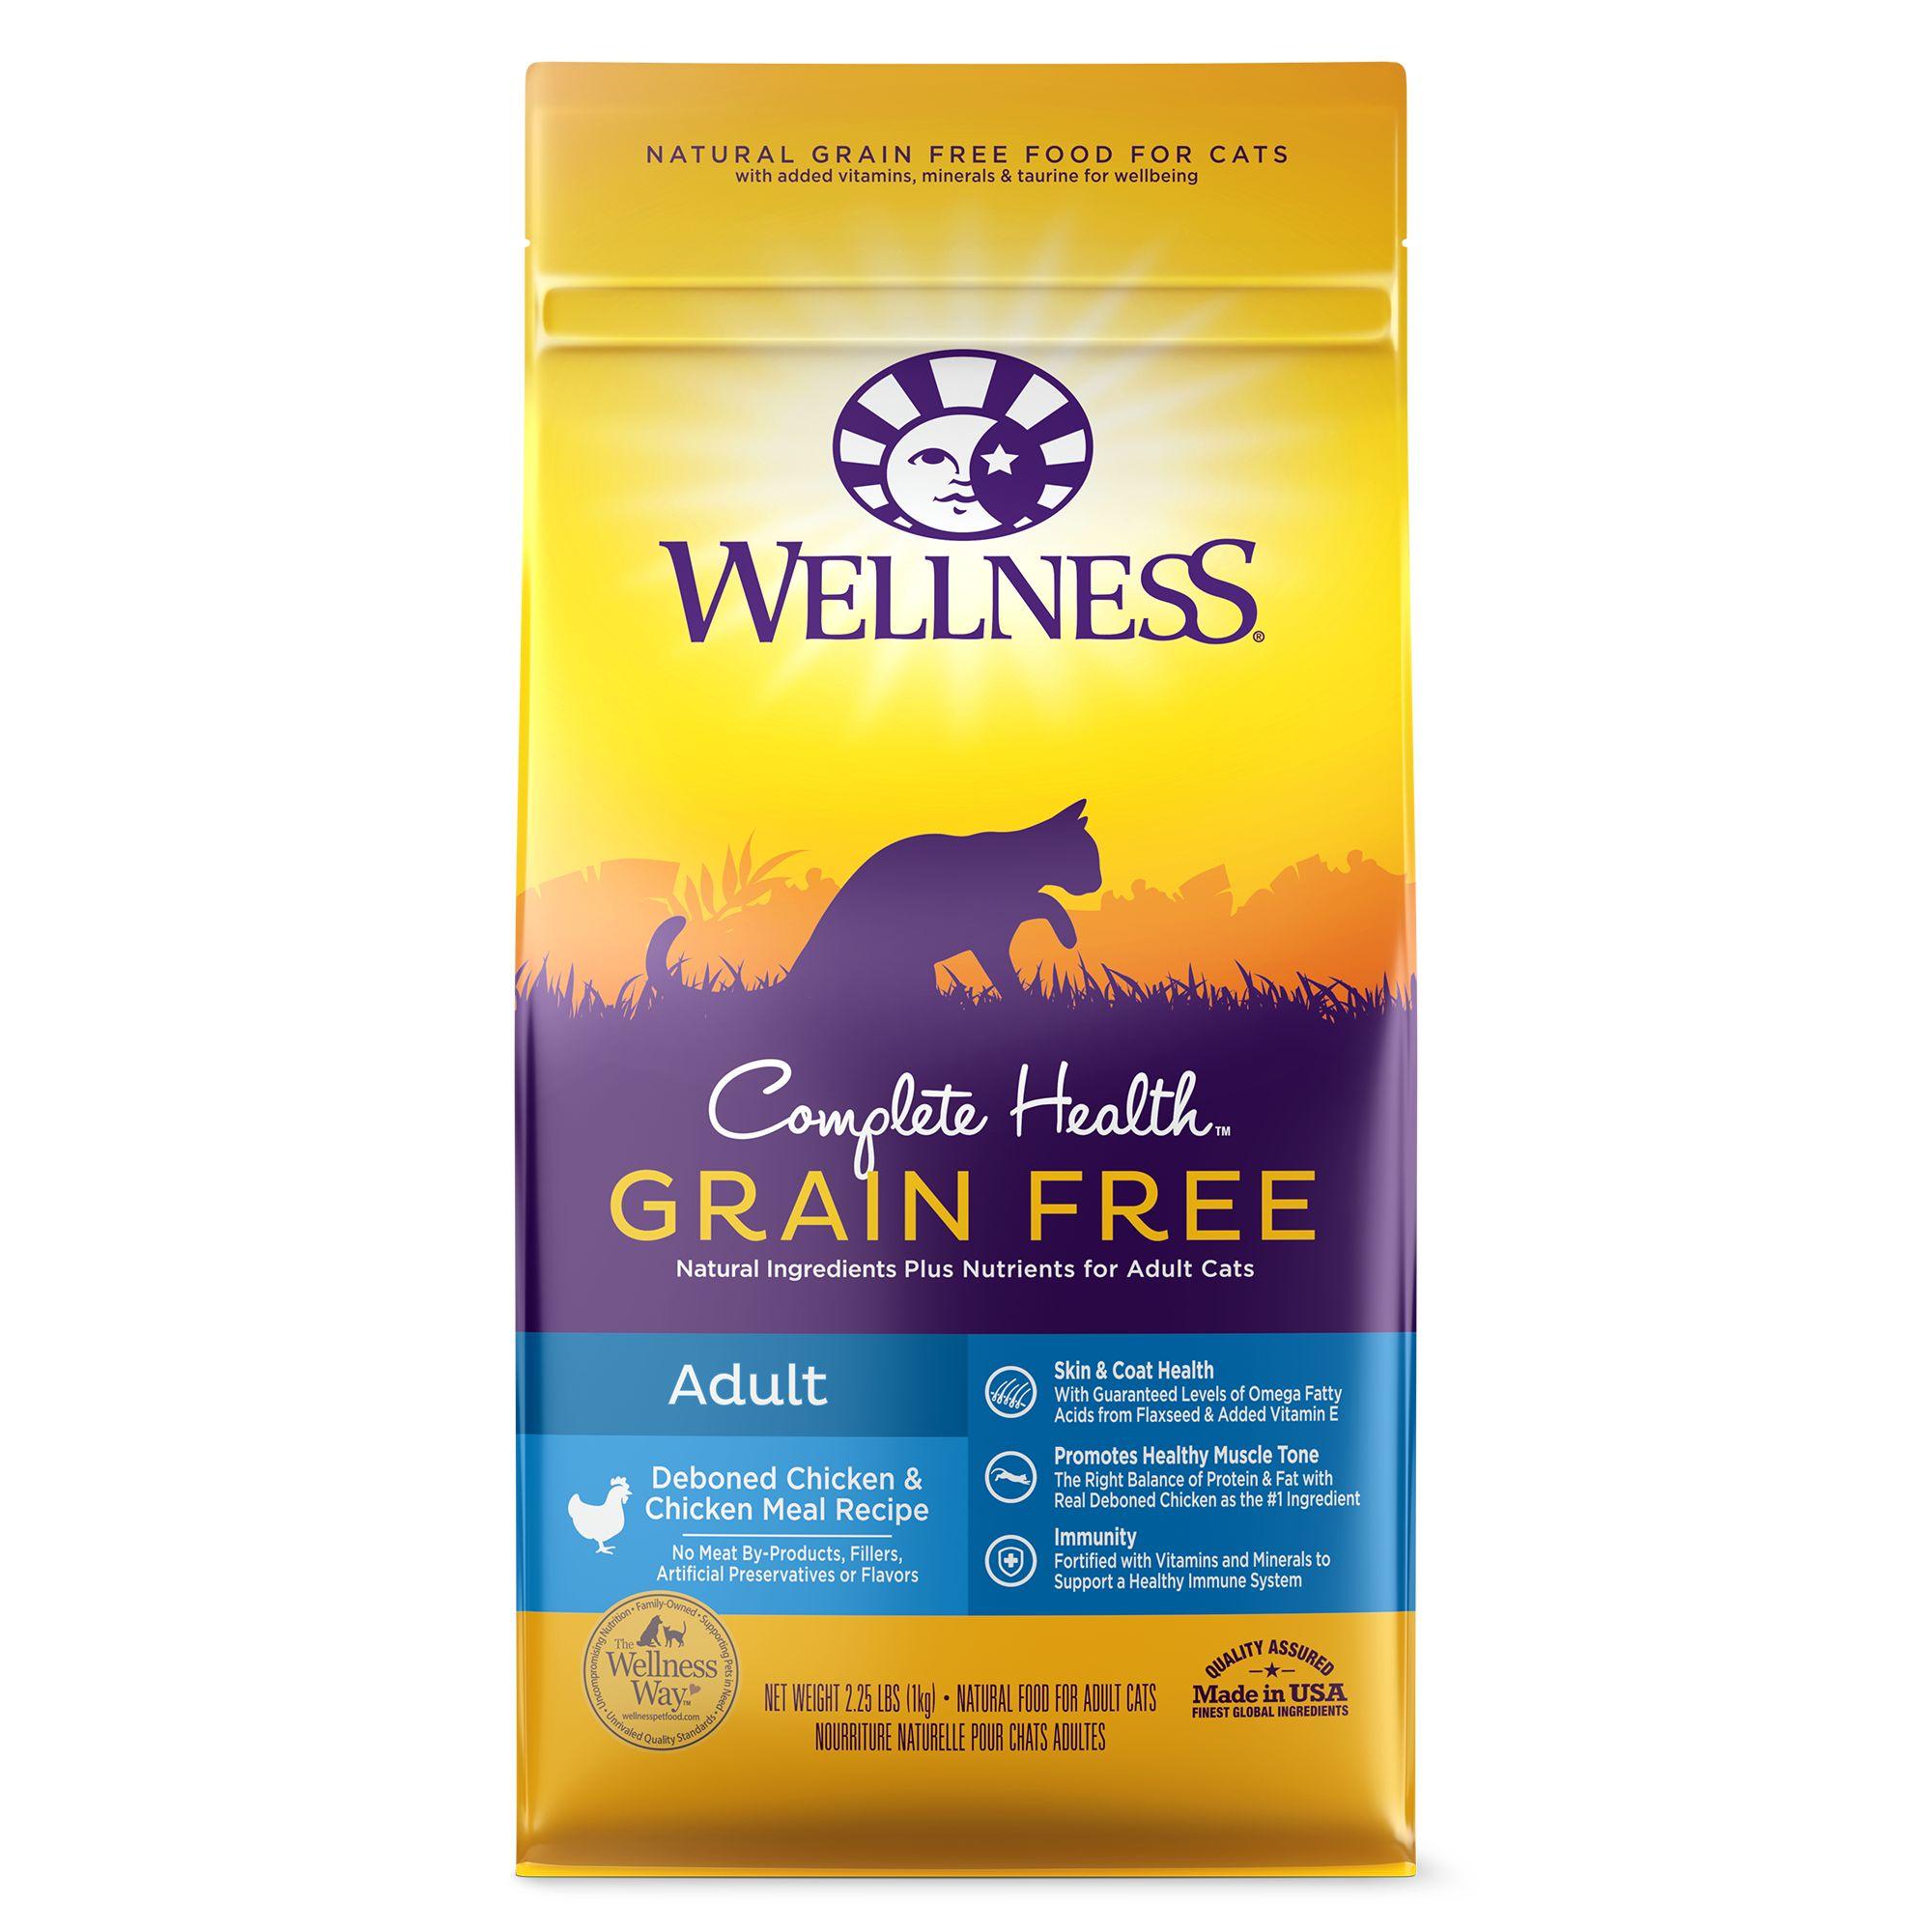 Wellness Complete Health Adult Cat Food Natural Grain Free